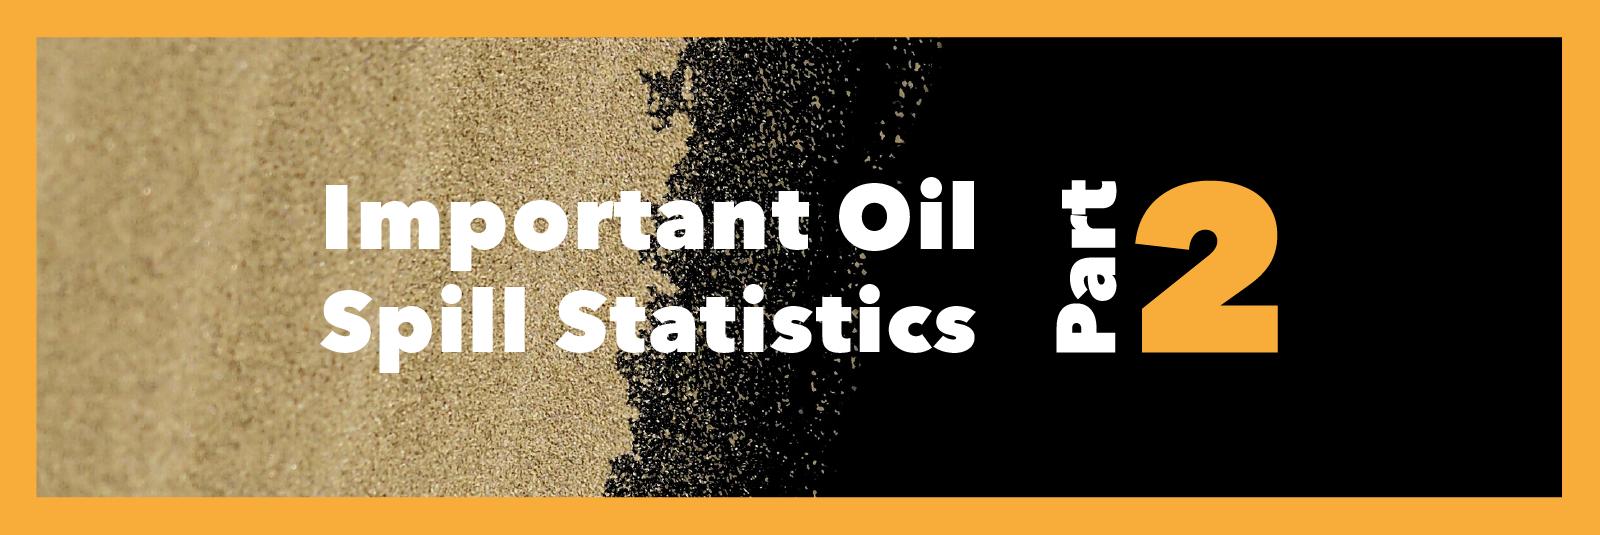 SHPI_Post_OilSpillStatistics2_Website